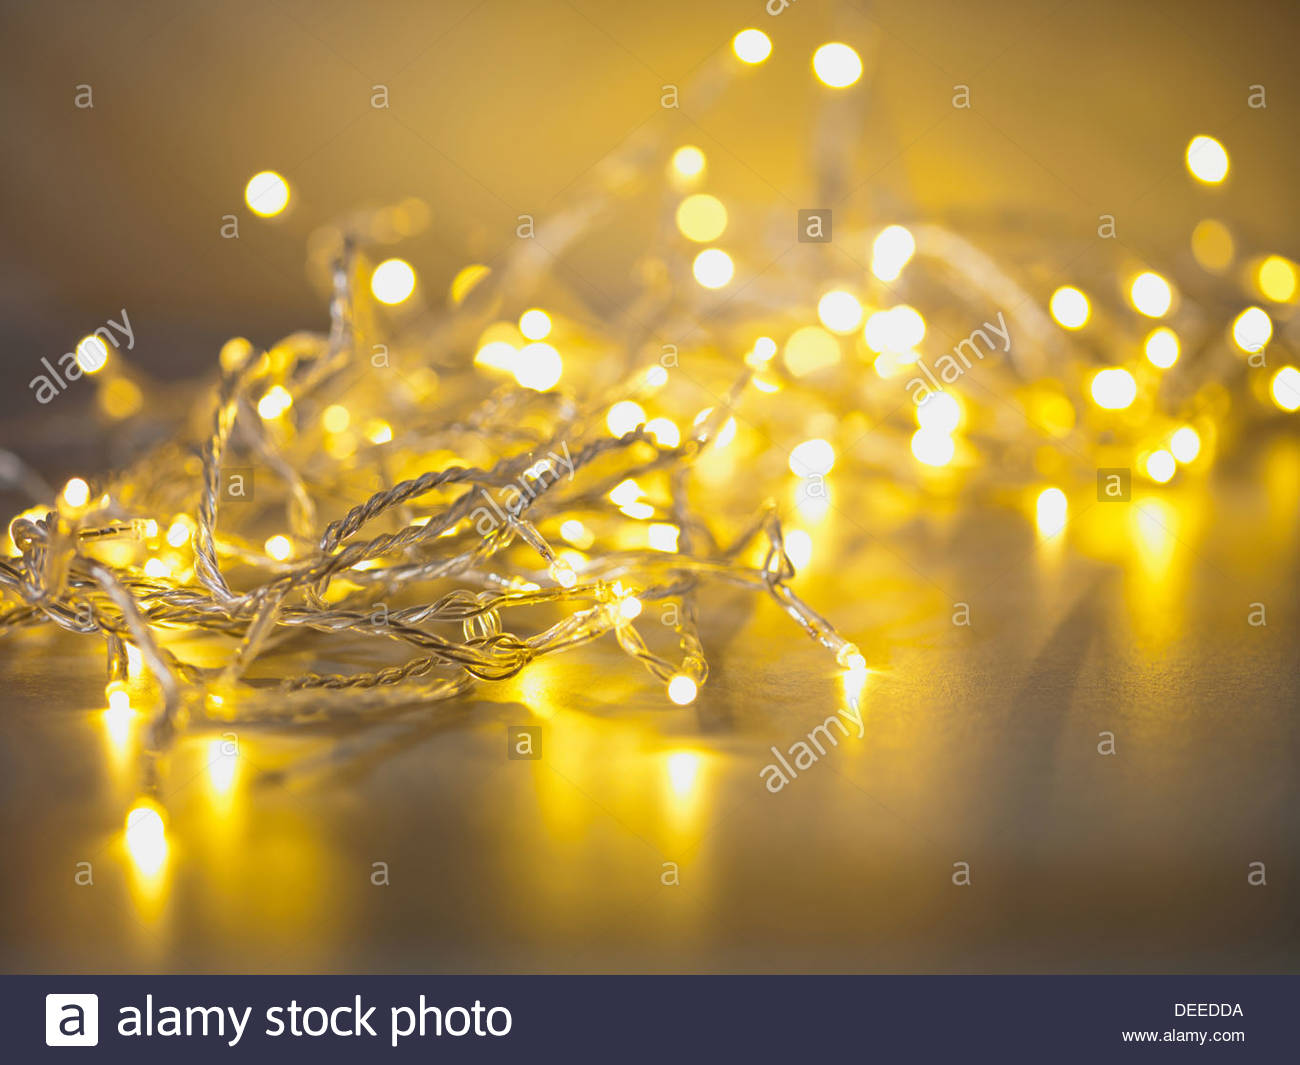 Pile of illuminated string lights - Stock Image